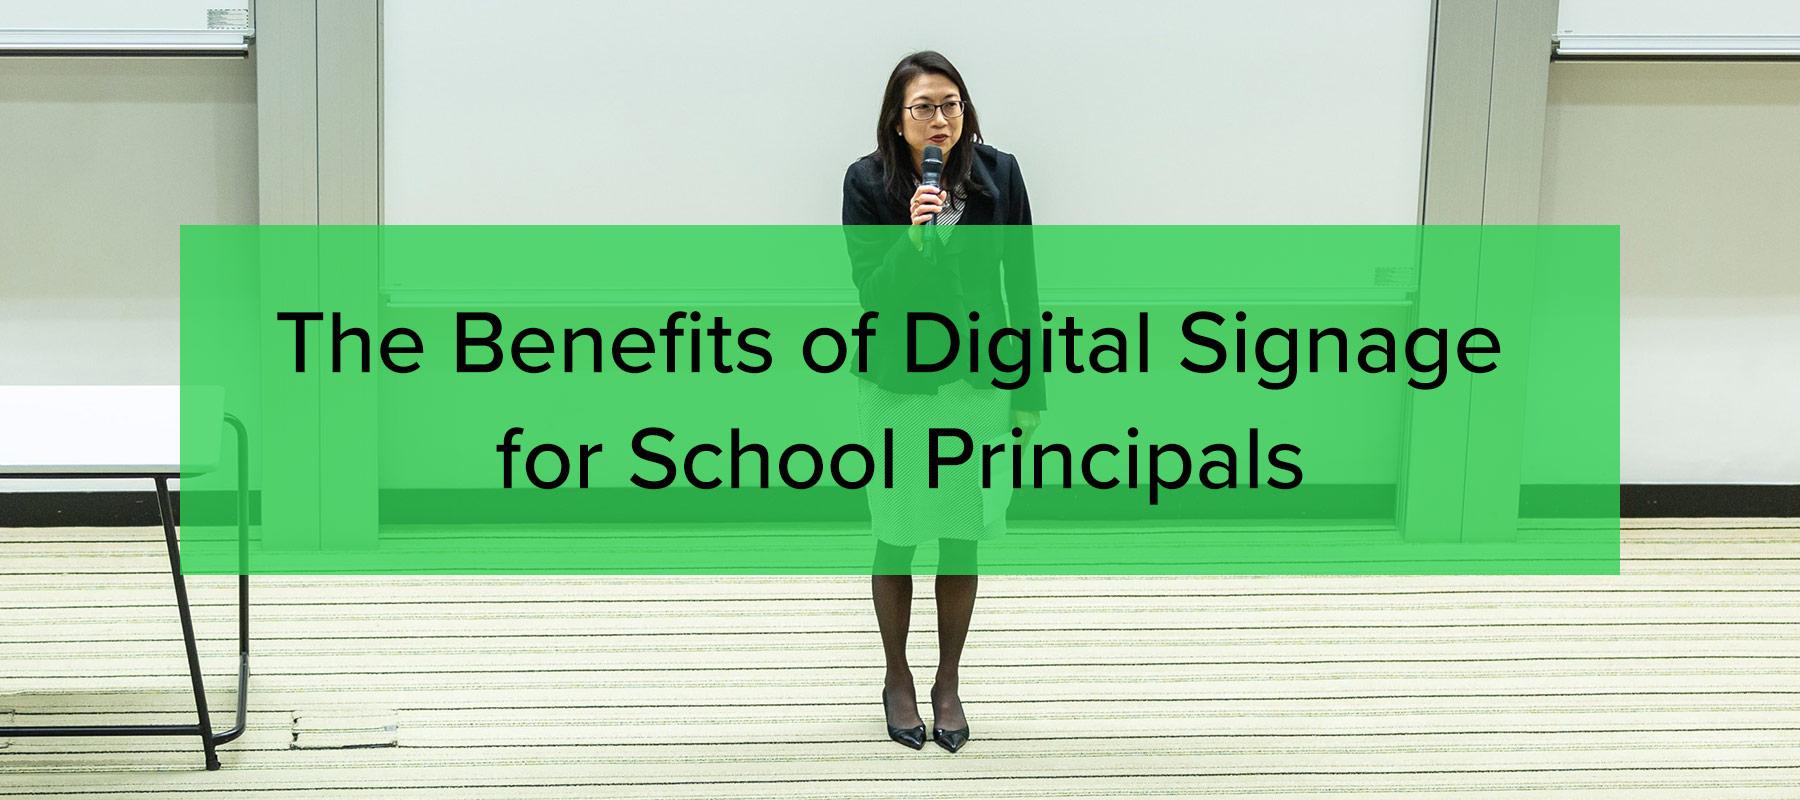 Benefits of digital signage for school principals